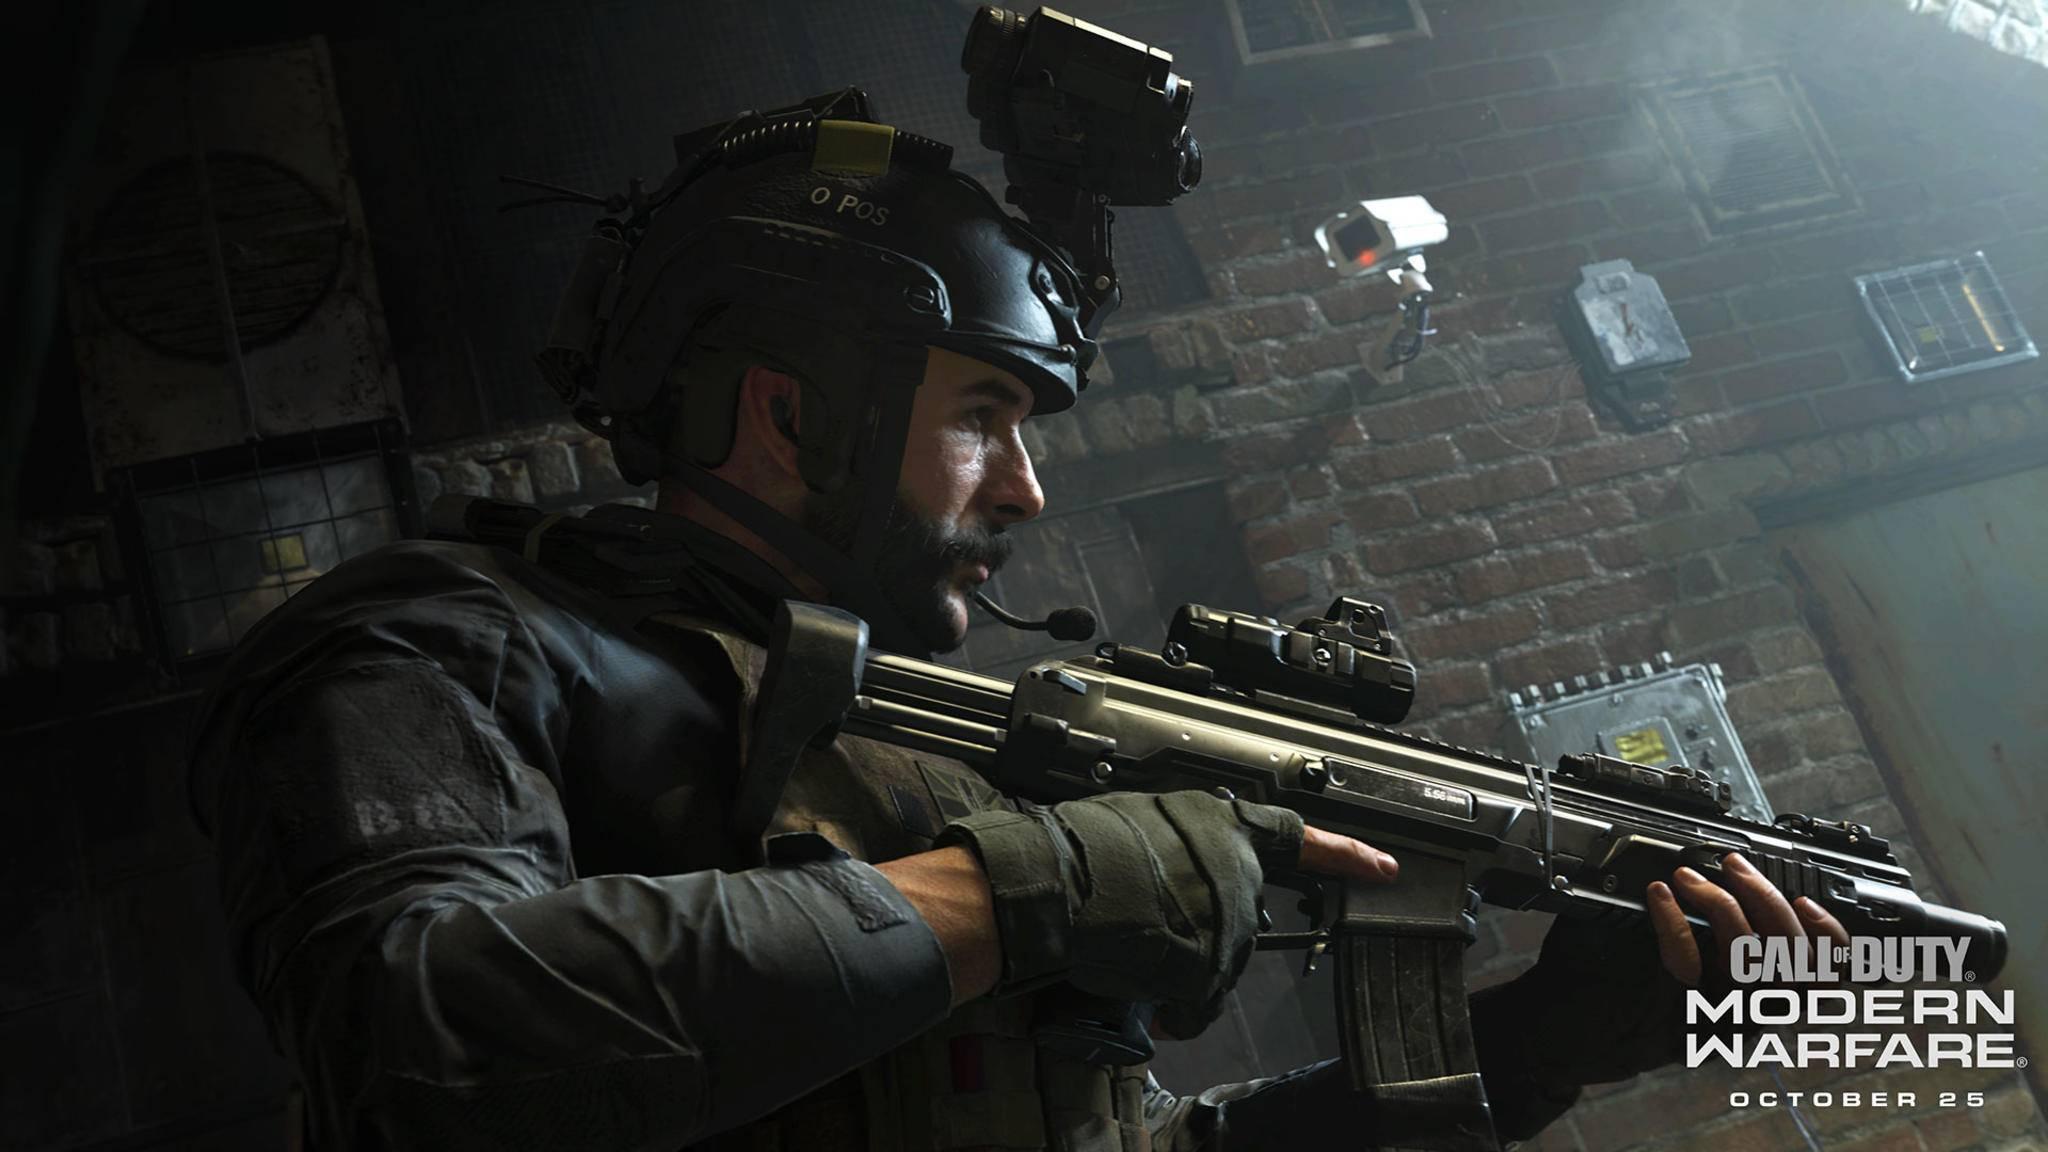 call-of-duty-modern-warfare-reveal (1)